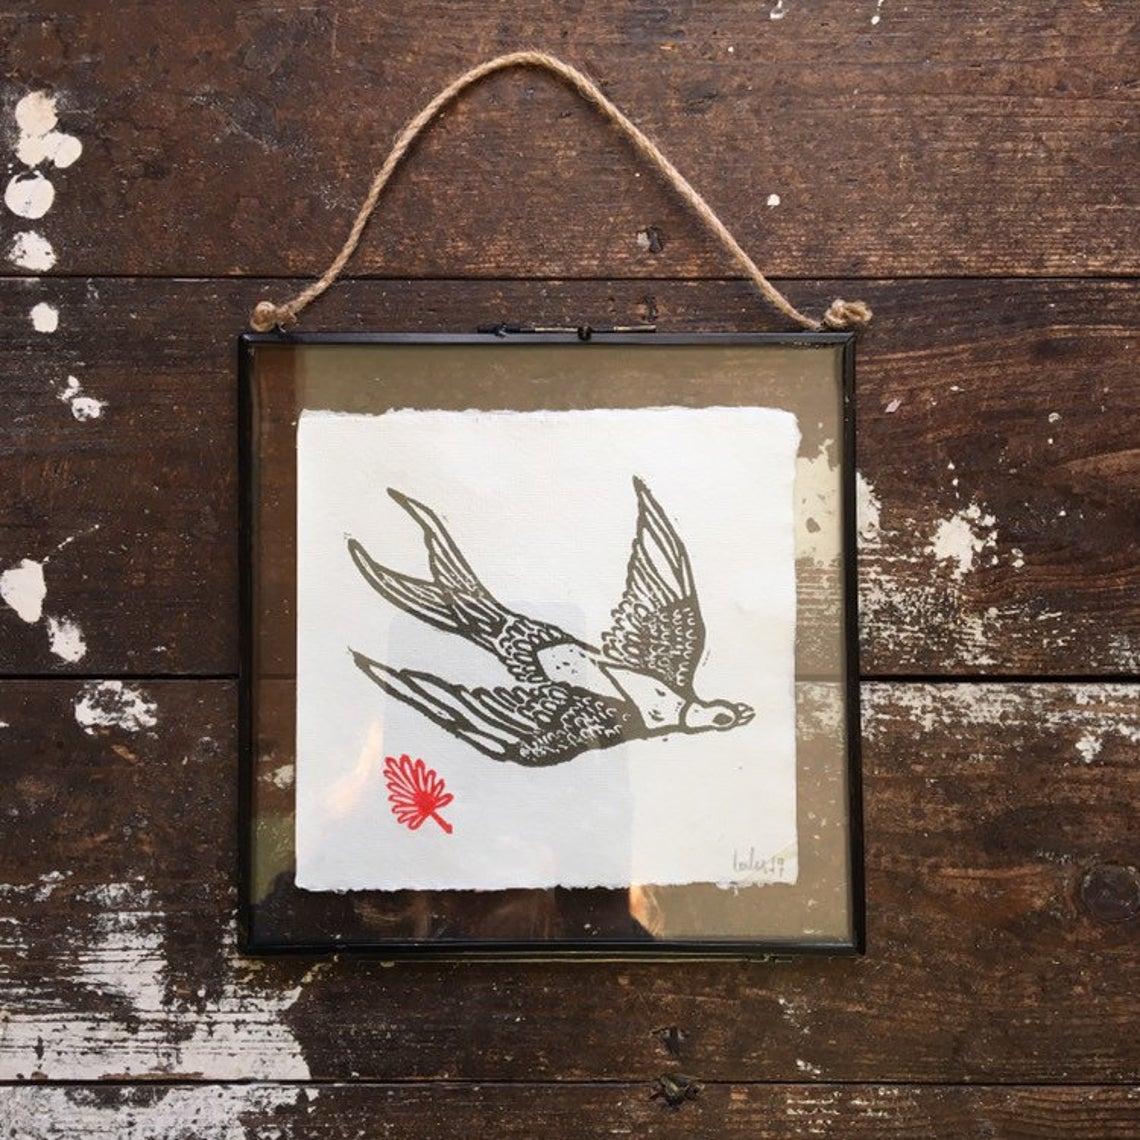 Bird in Flight - Framed Hand Printed Lino Print in Vintage Metal Glass Frame